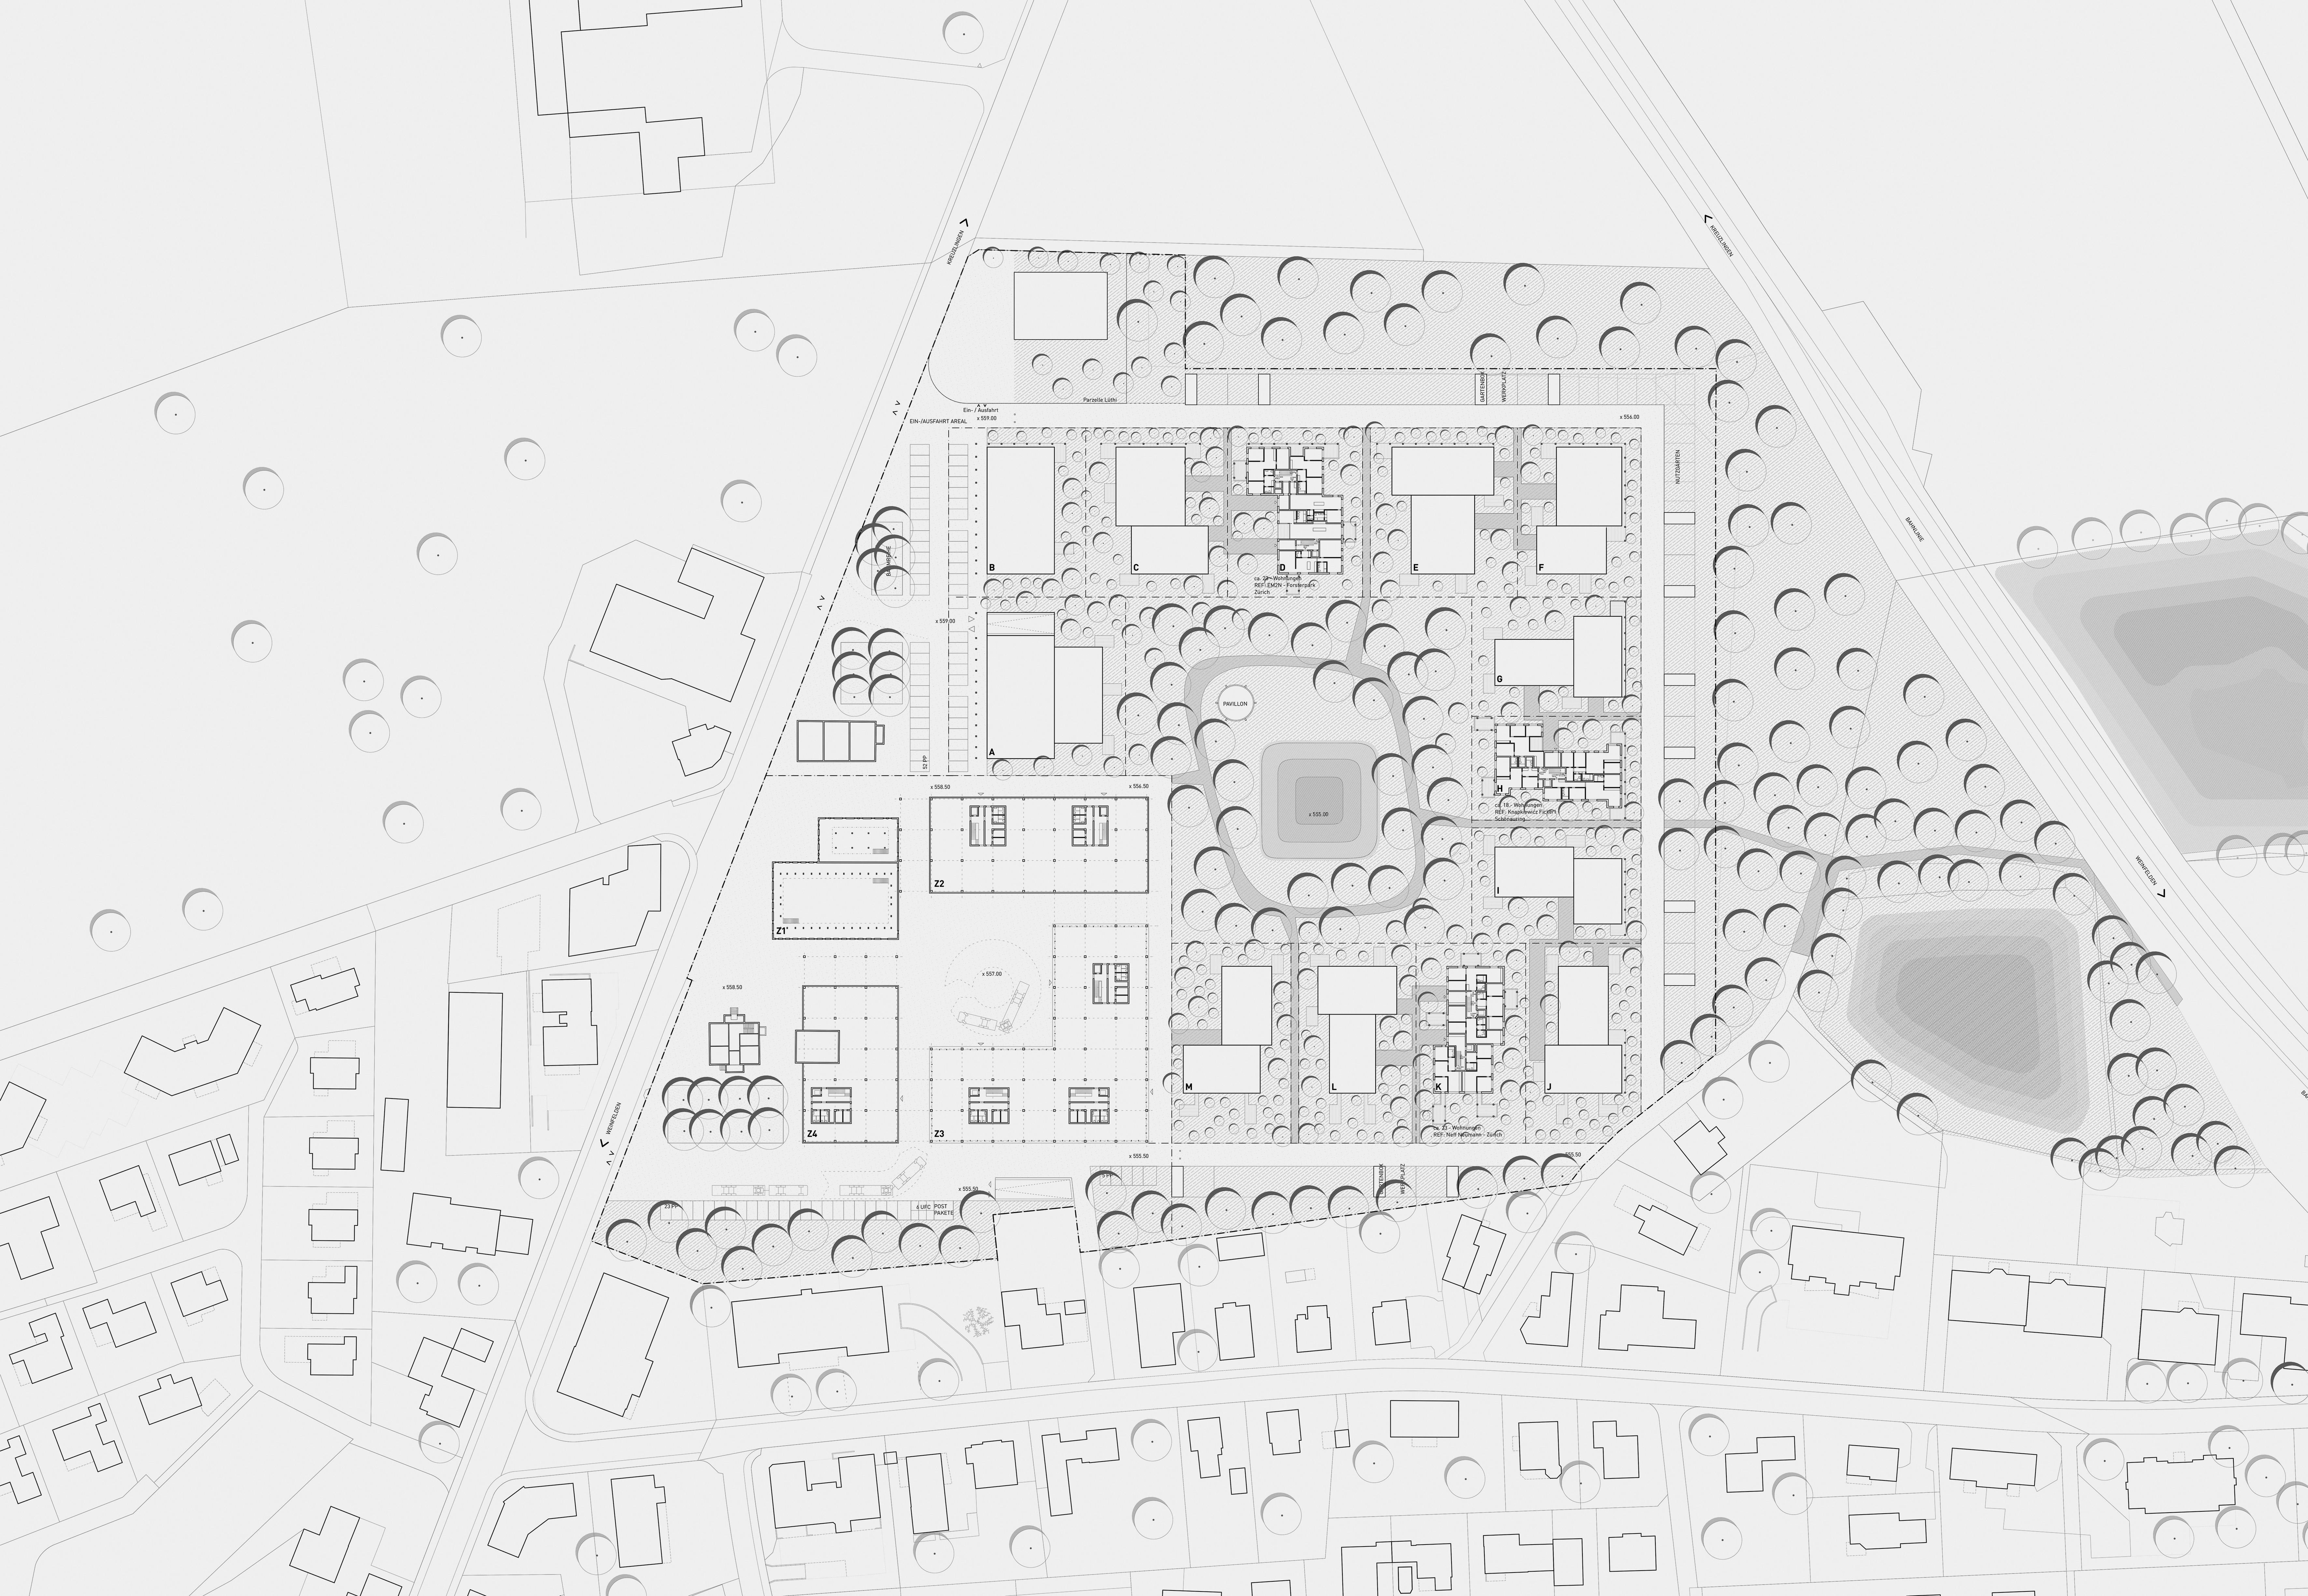 Richtprojekt Ziegelei Berg: Richtprojekt